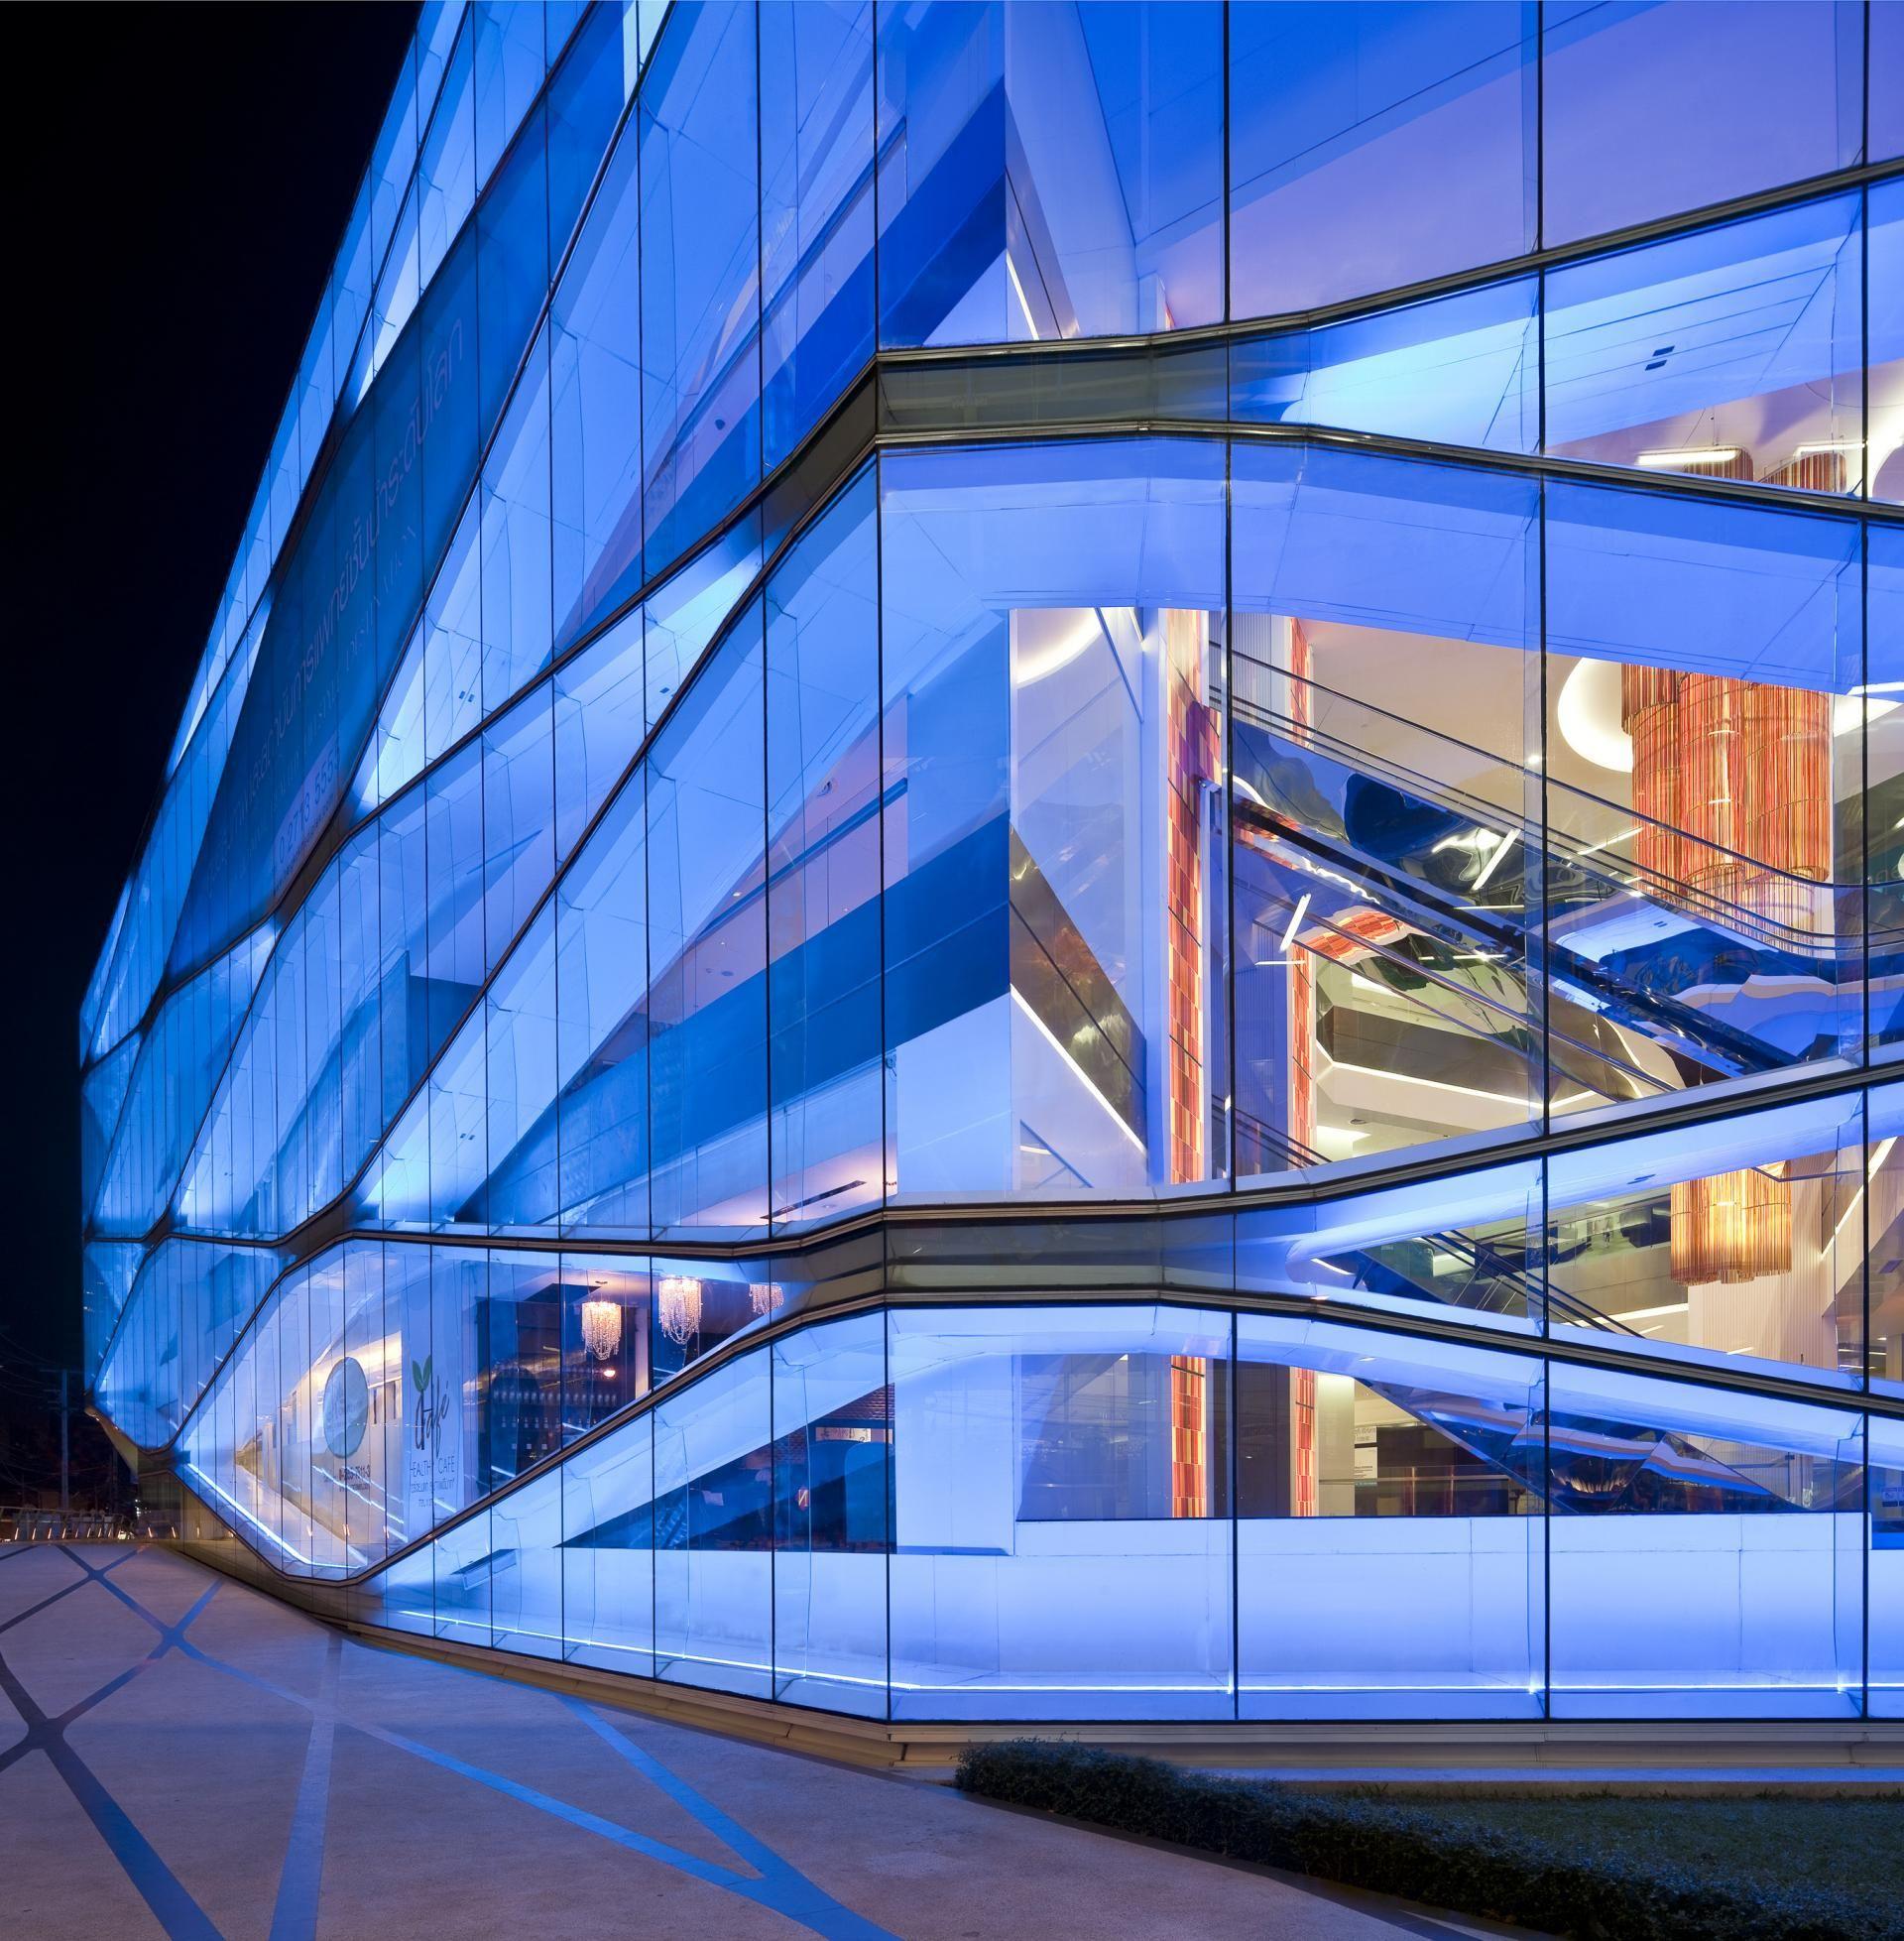 Bangkok Mediplex By Orbit Design Studio Thailand, Futuristic Architecture, Modern